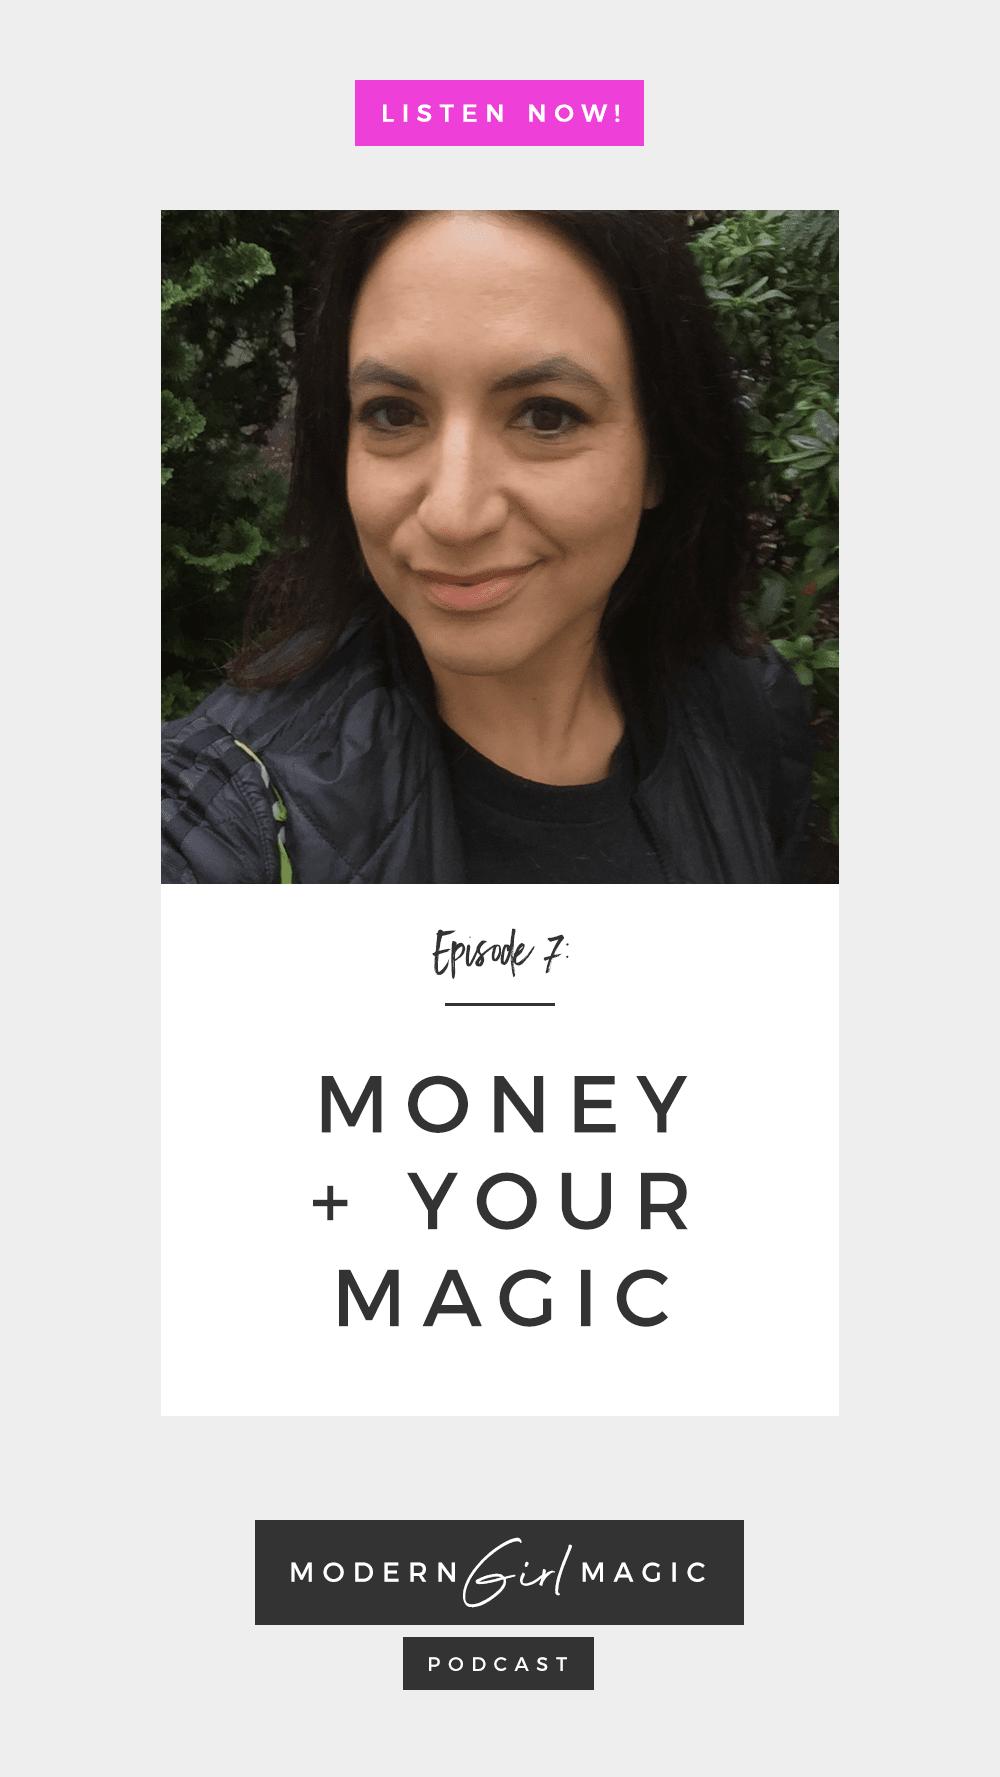 Modern Girl Magic Podcast Episode #7: Magic + Your Money